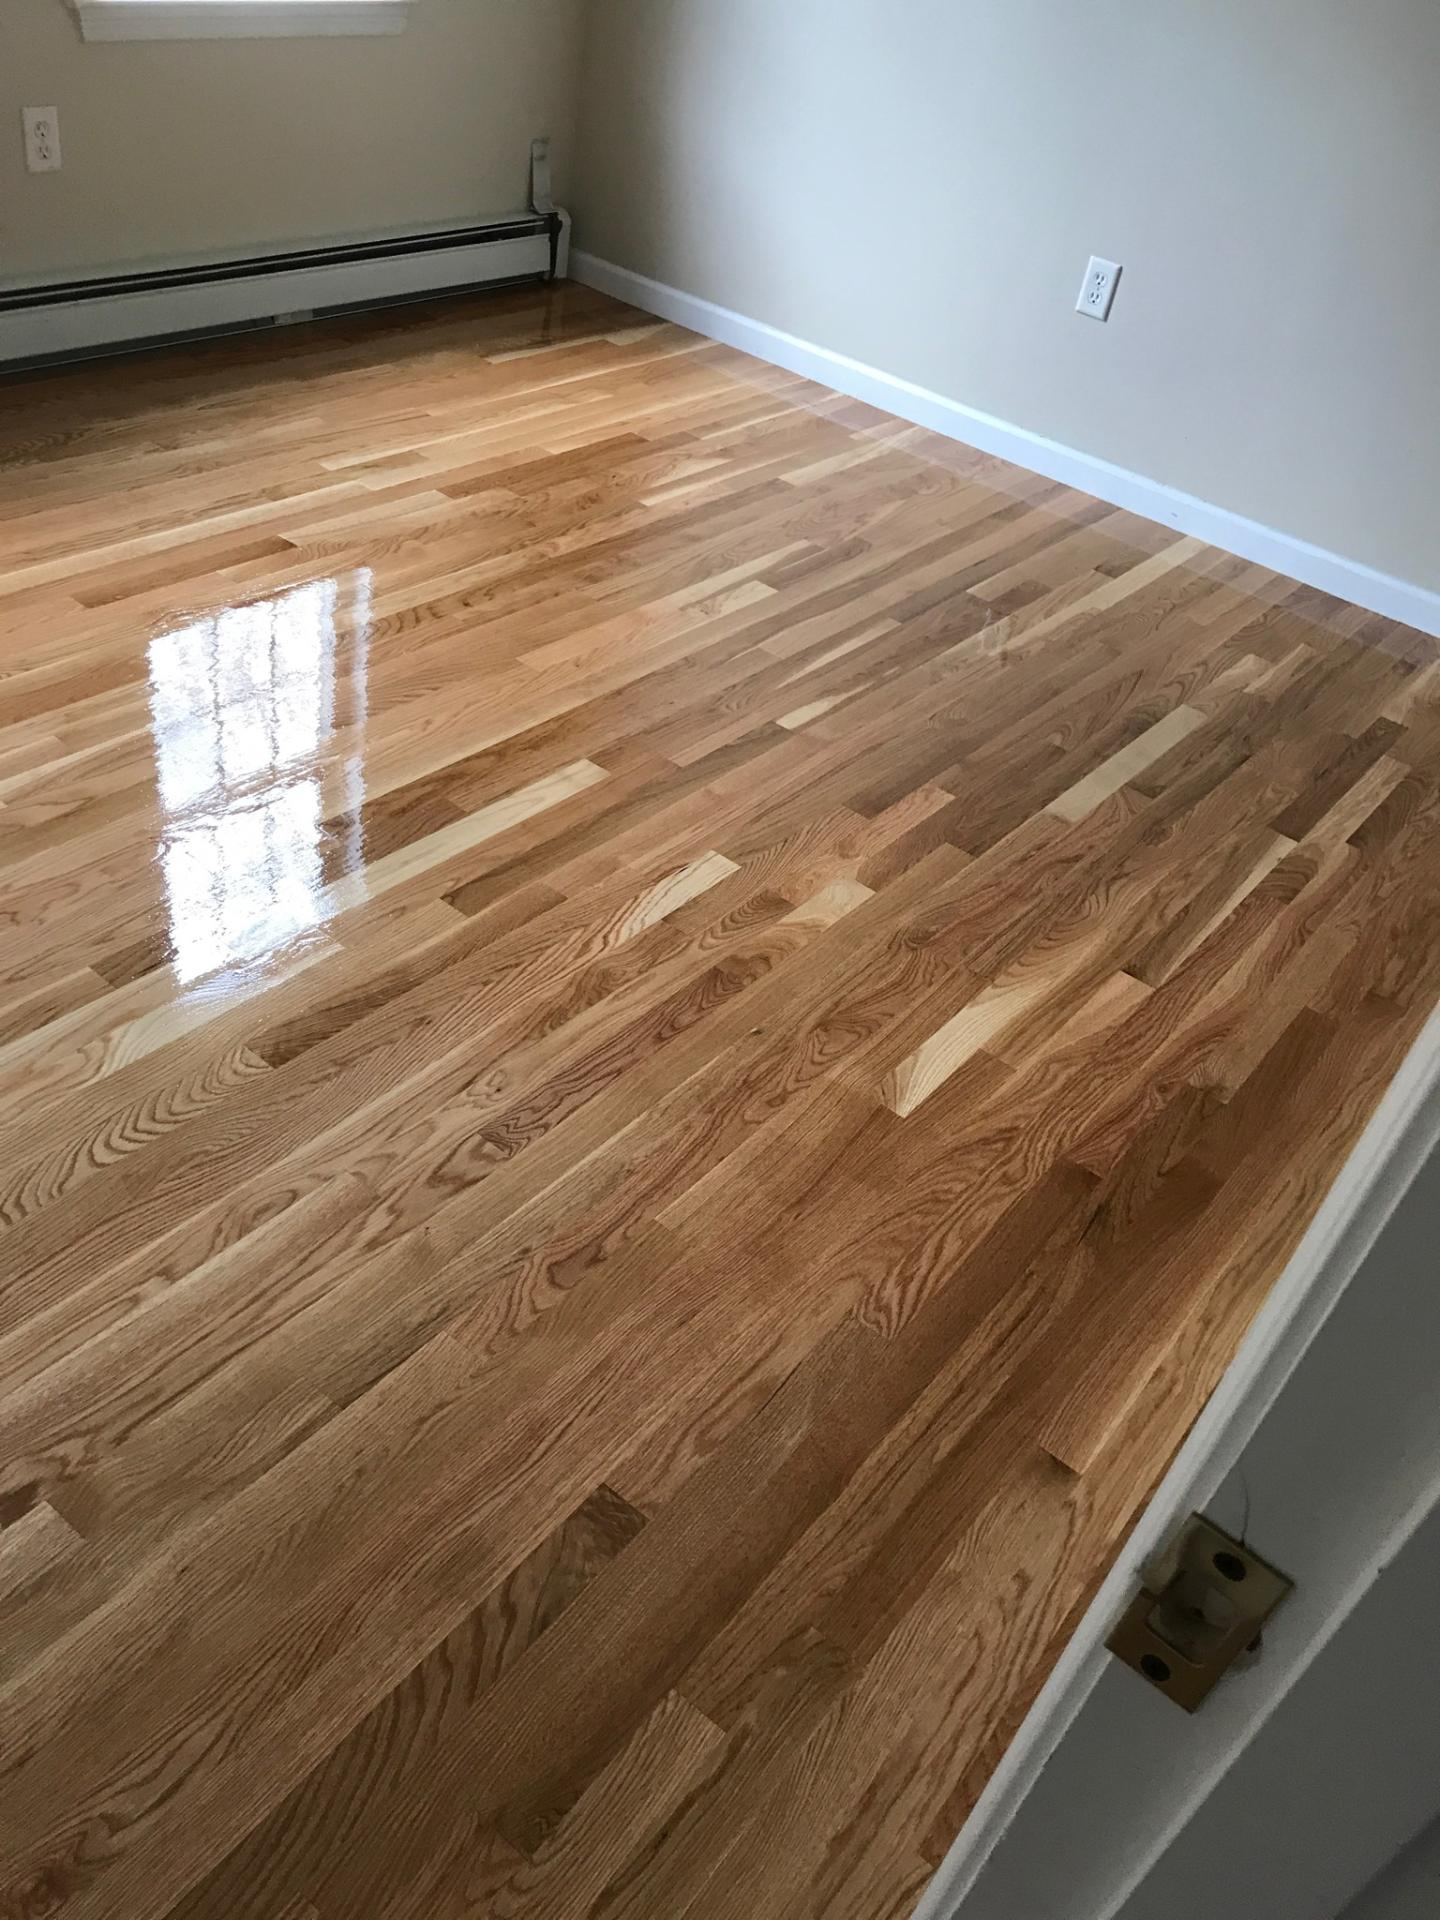 Natural White Oak Hardwood Floors  Central Mass Hardwood Inc